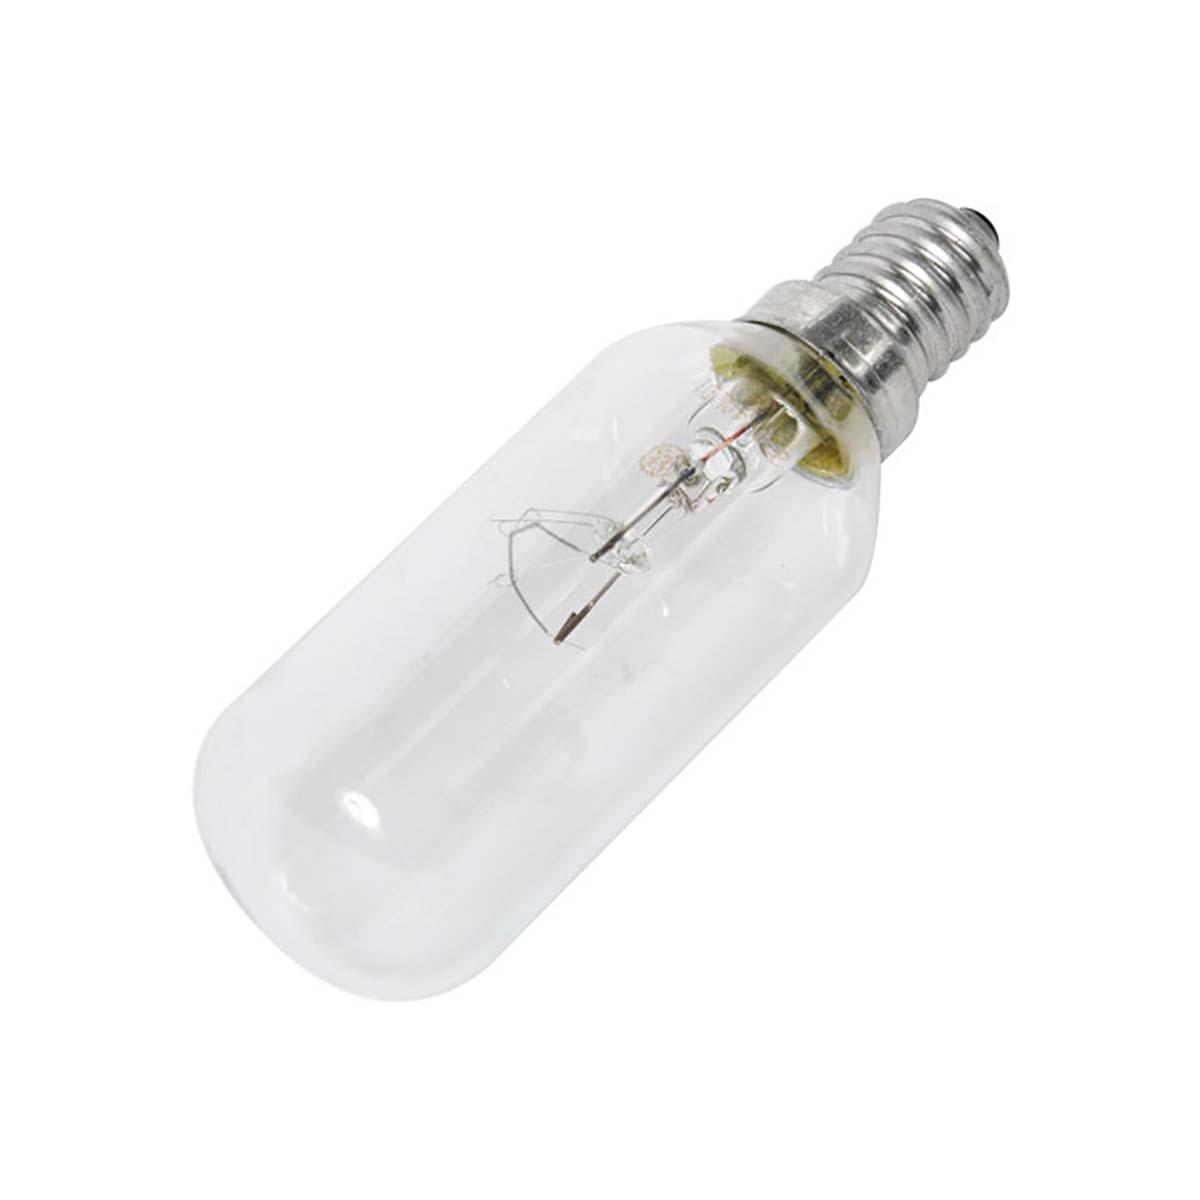 backofenlampen-e14-40-w-original-teilenummer-50279890003